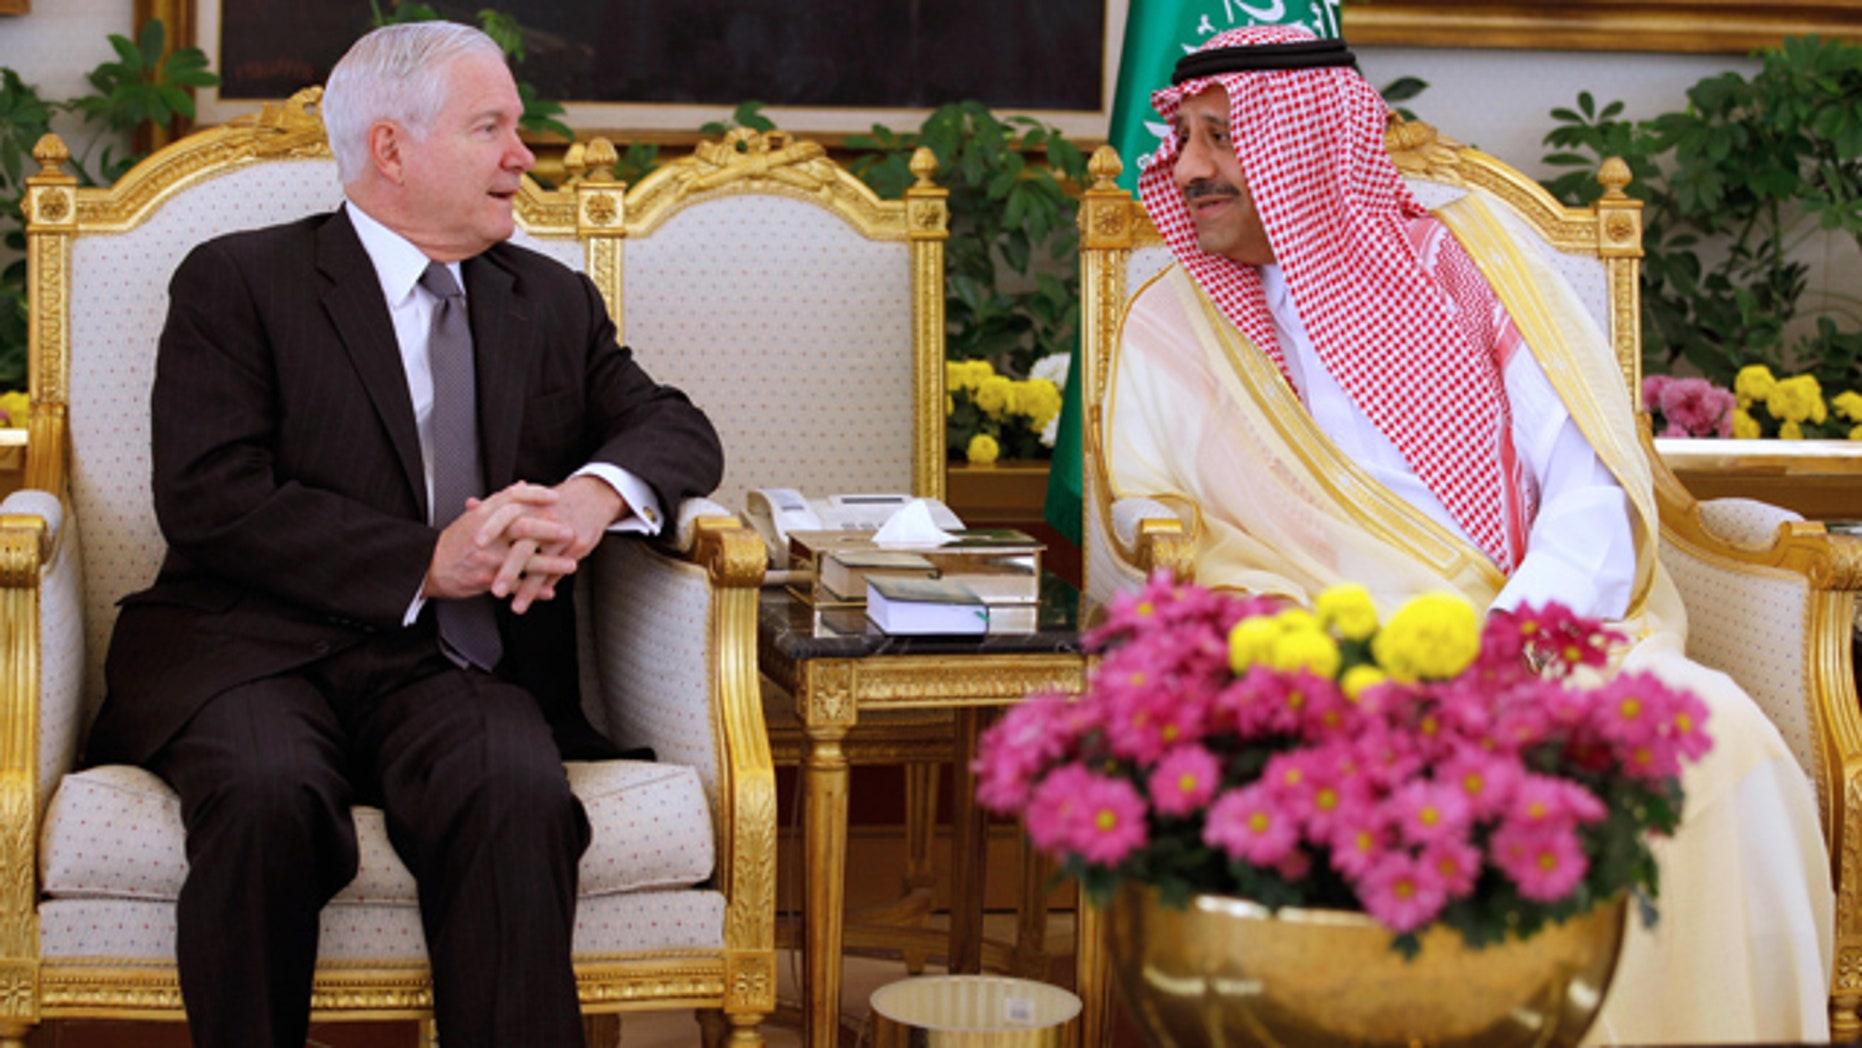 April 6: U.S.  Defense Secretary Robert Gates, left, talks with Saudi Assistant Minister of Defense and Aviation Prince Khalid bin Sultan during a  ceremony in Riyadh, Saudi Arabia.